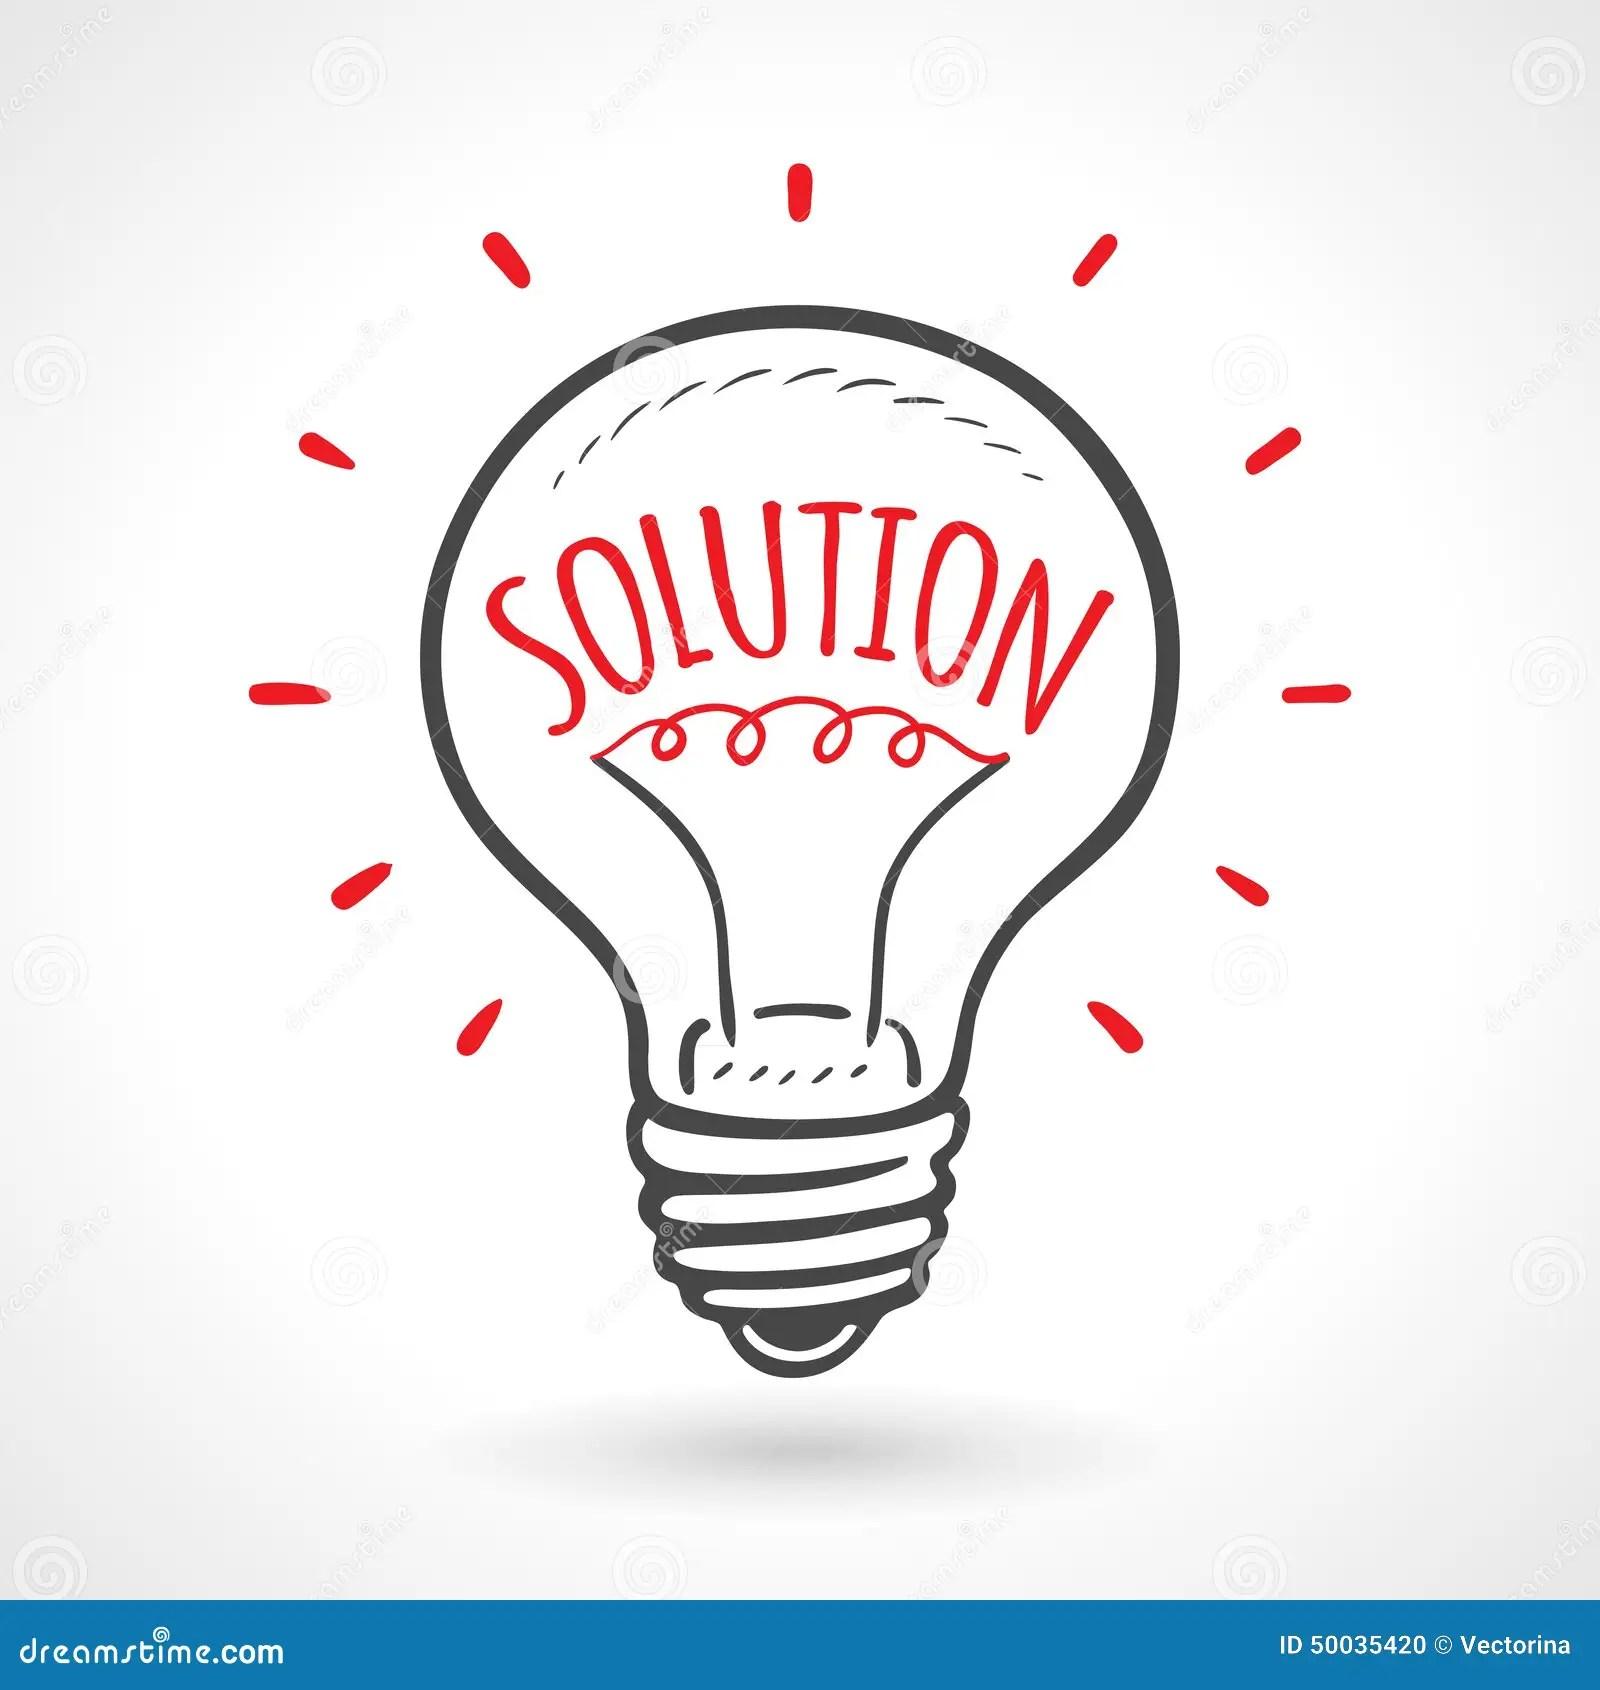 Solution Bulb Hand Drawn Idea Concept Stock Vector